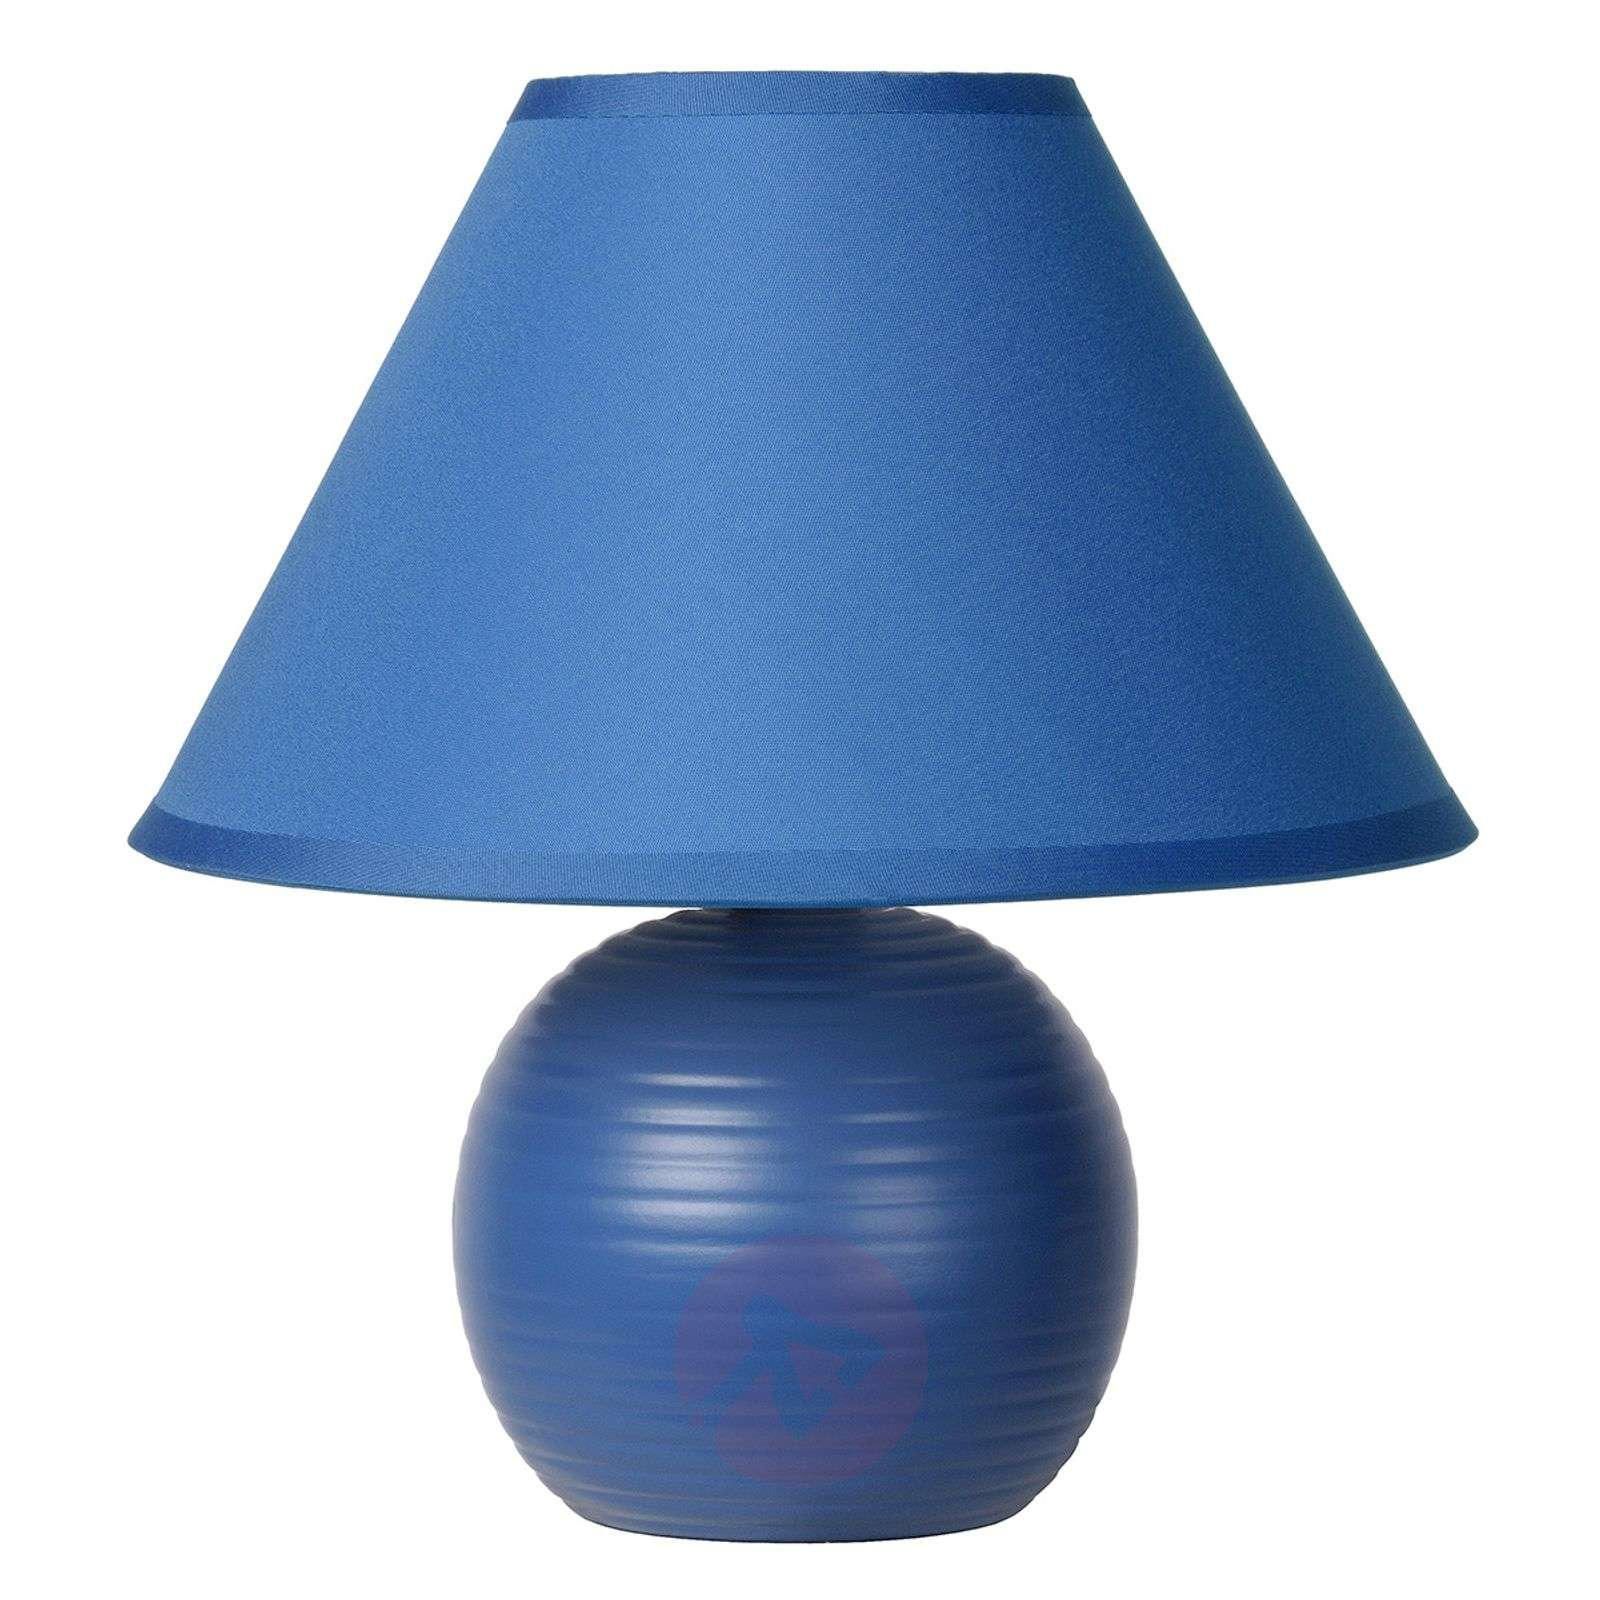 Blue fabric Kaddy table lamp-6054942-01